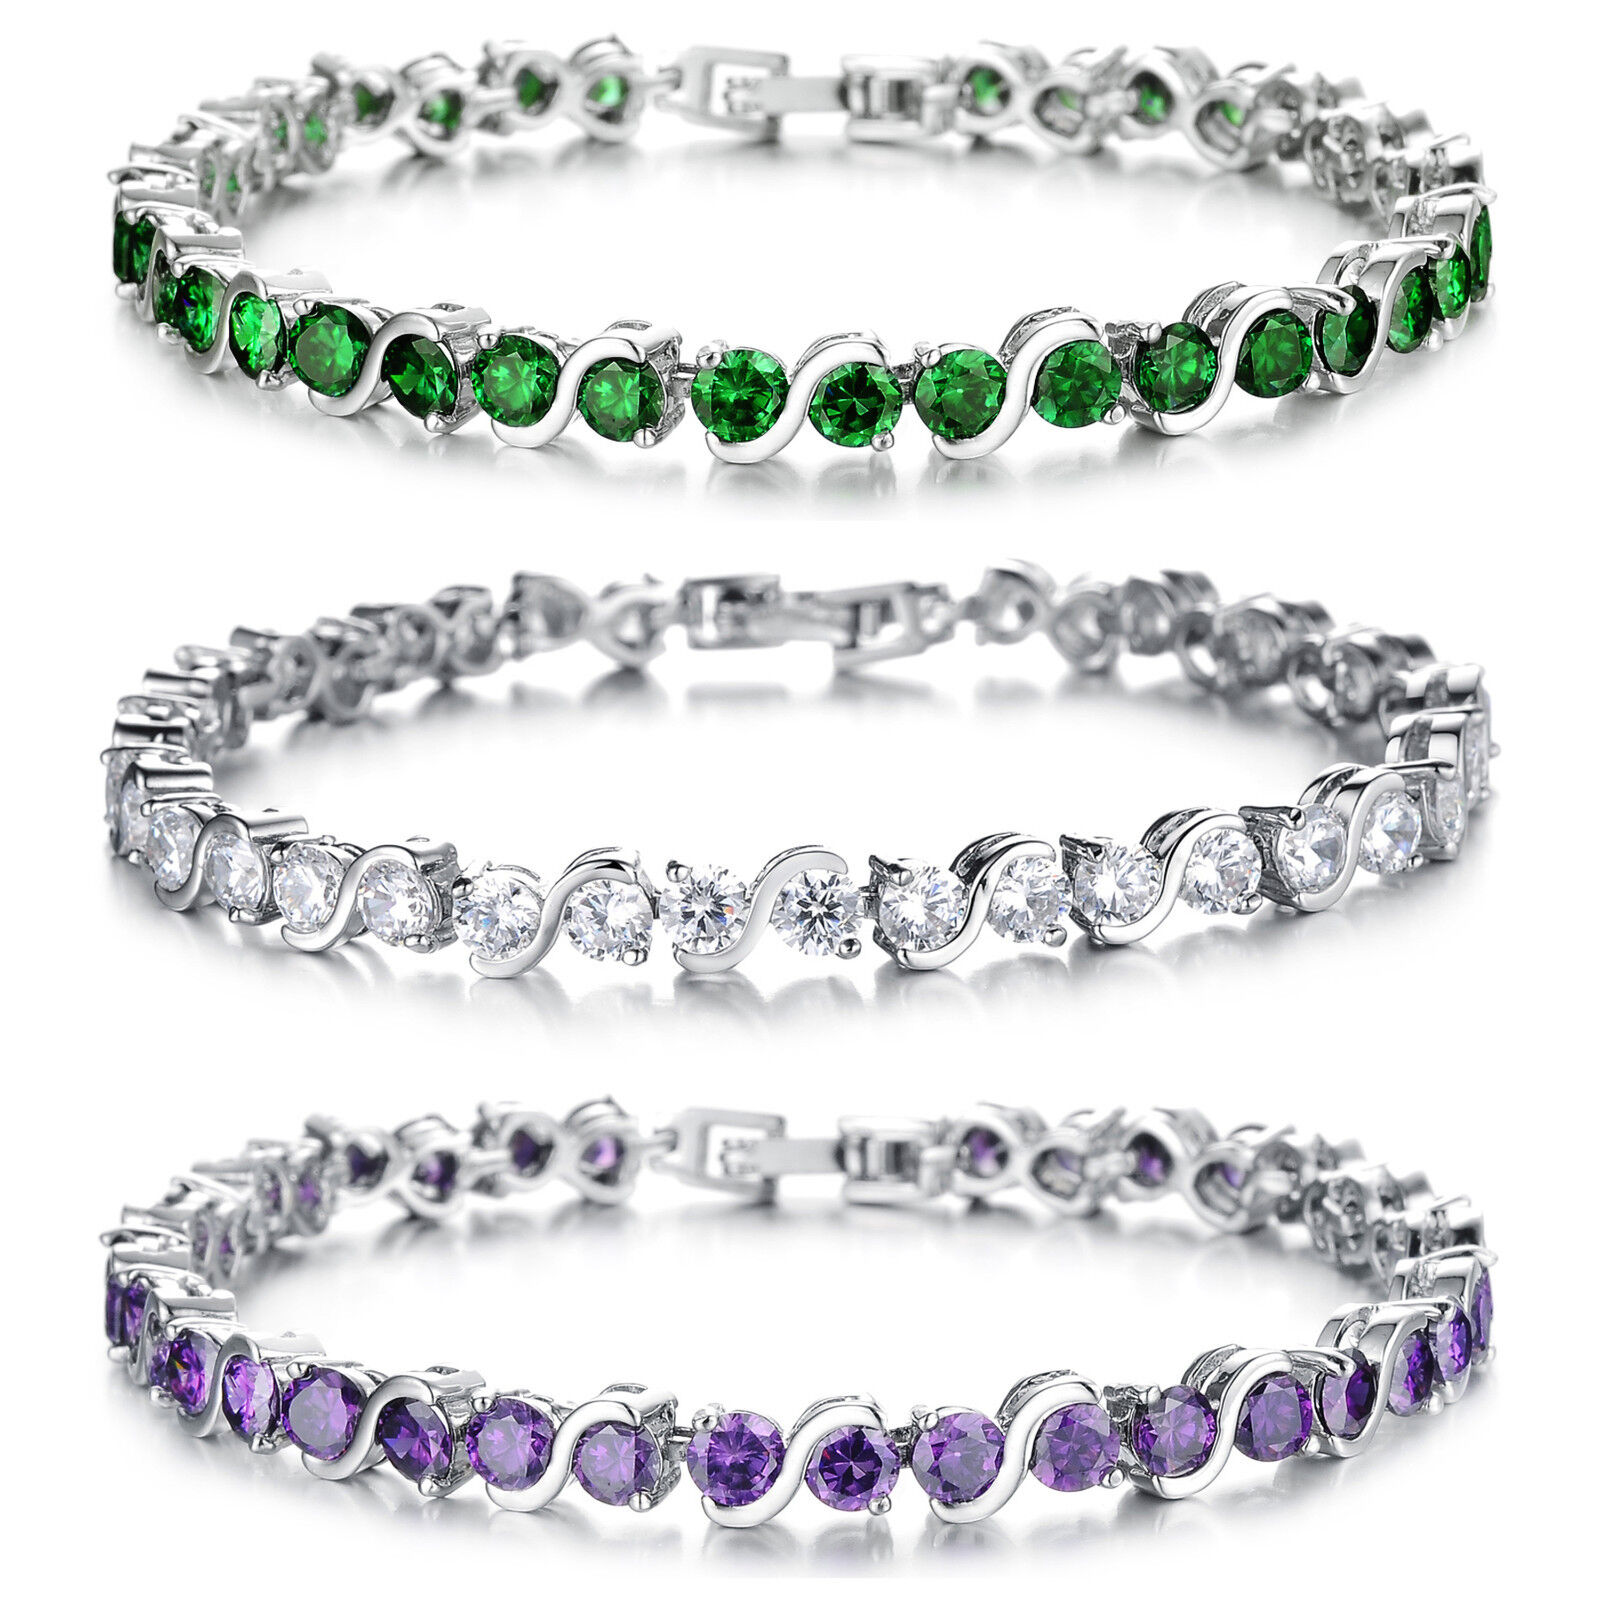 Women's Bracelet, White Gold Plated Infinity Cubic Zirconia Tennis Bracelet Bracelets